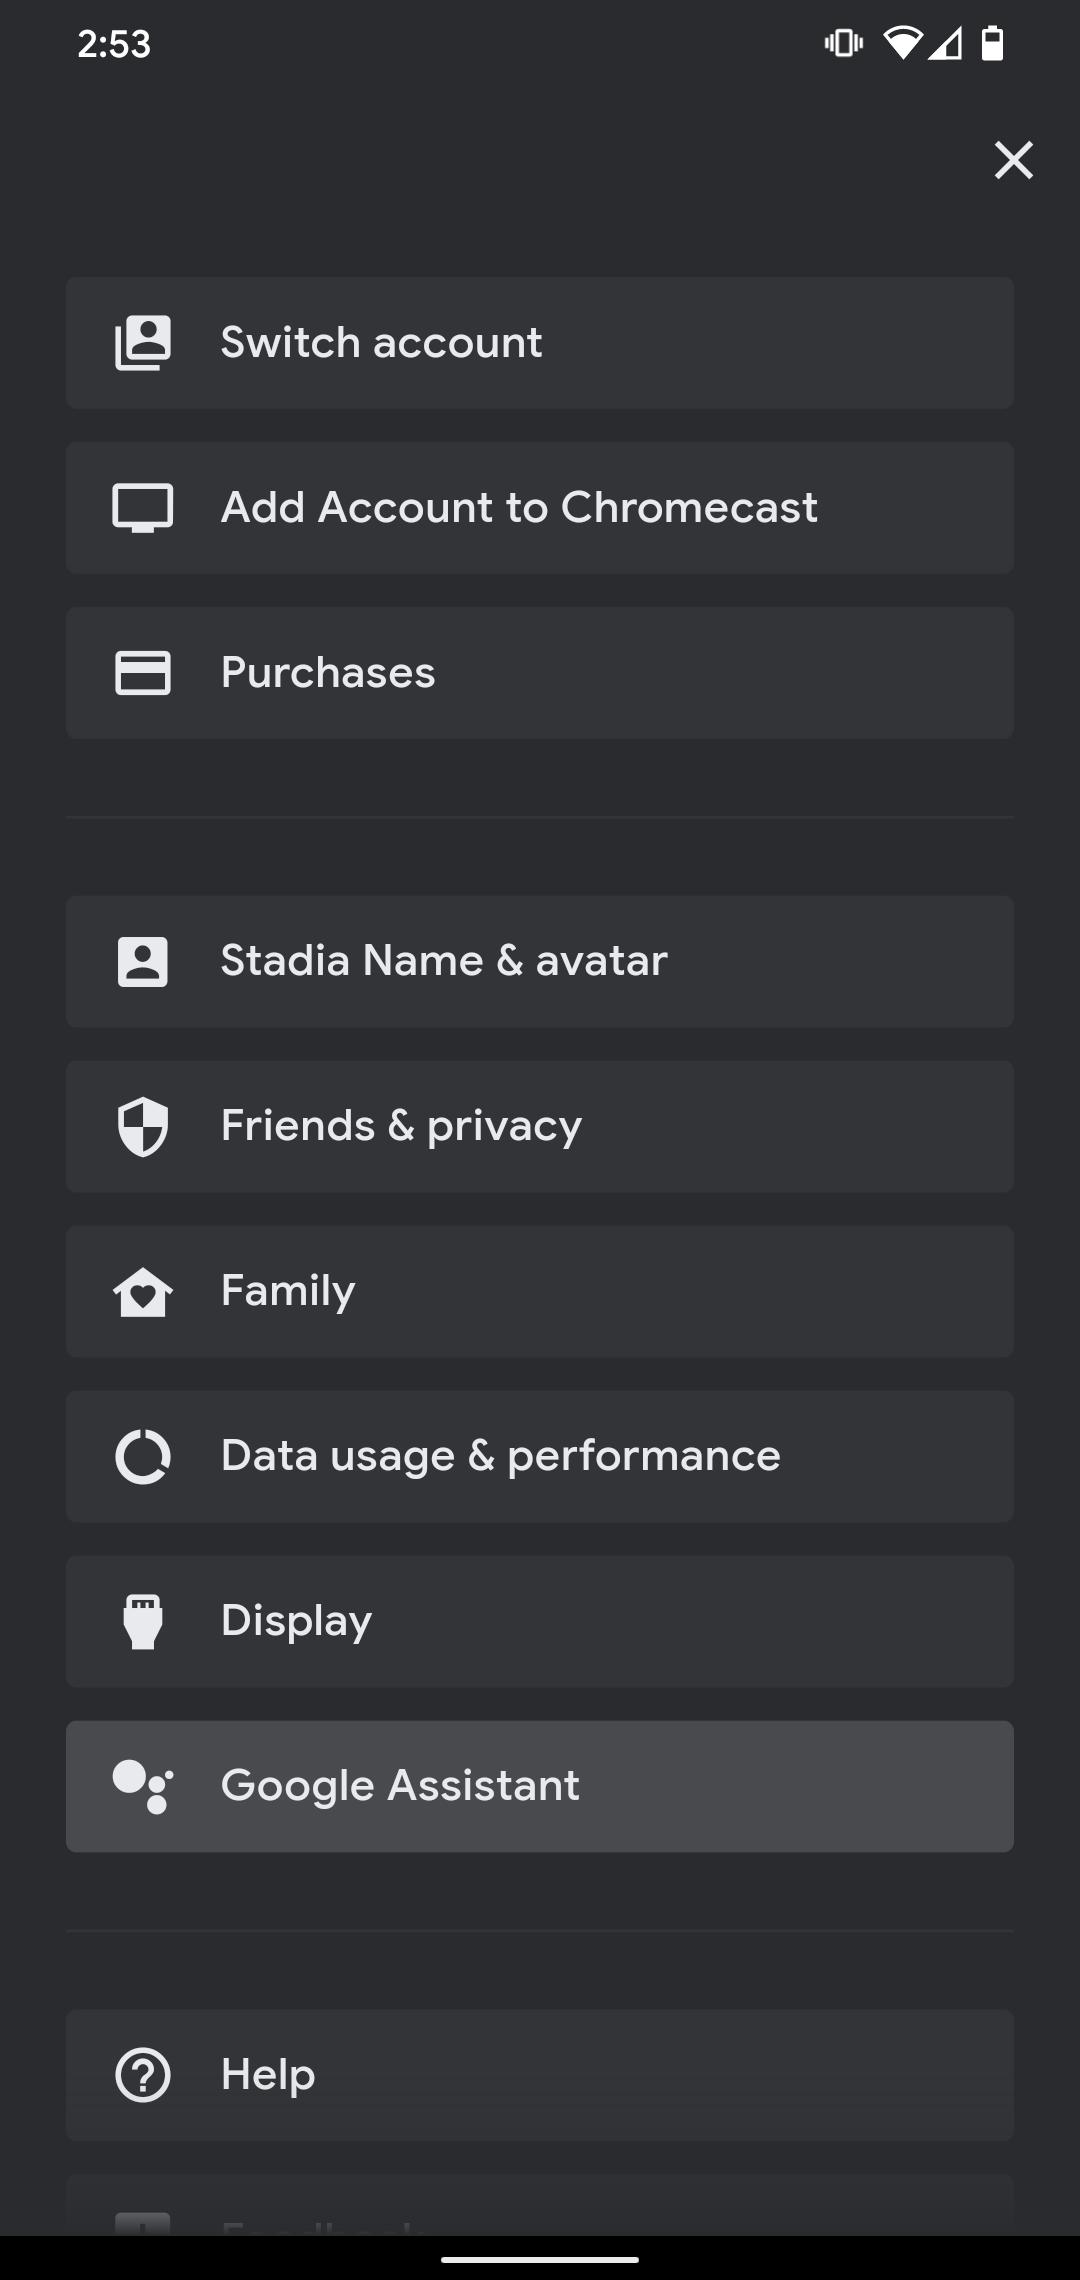 Stadia Google Assistant